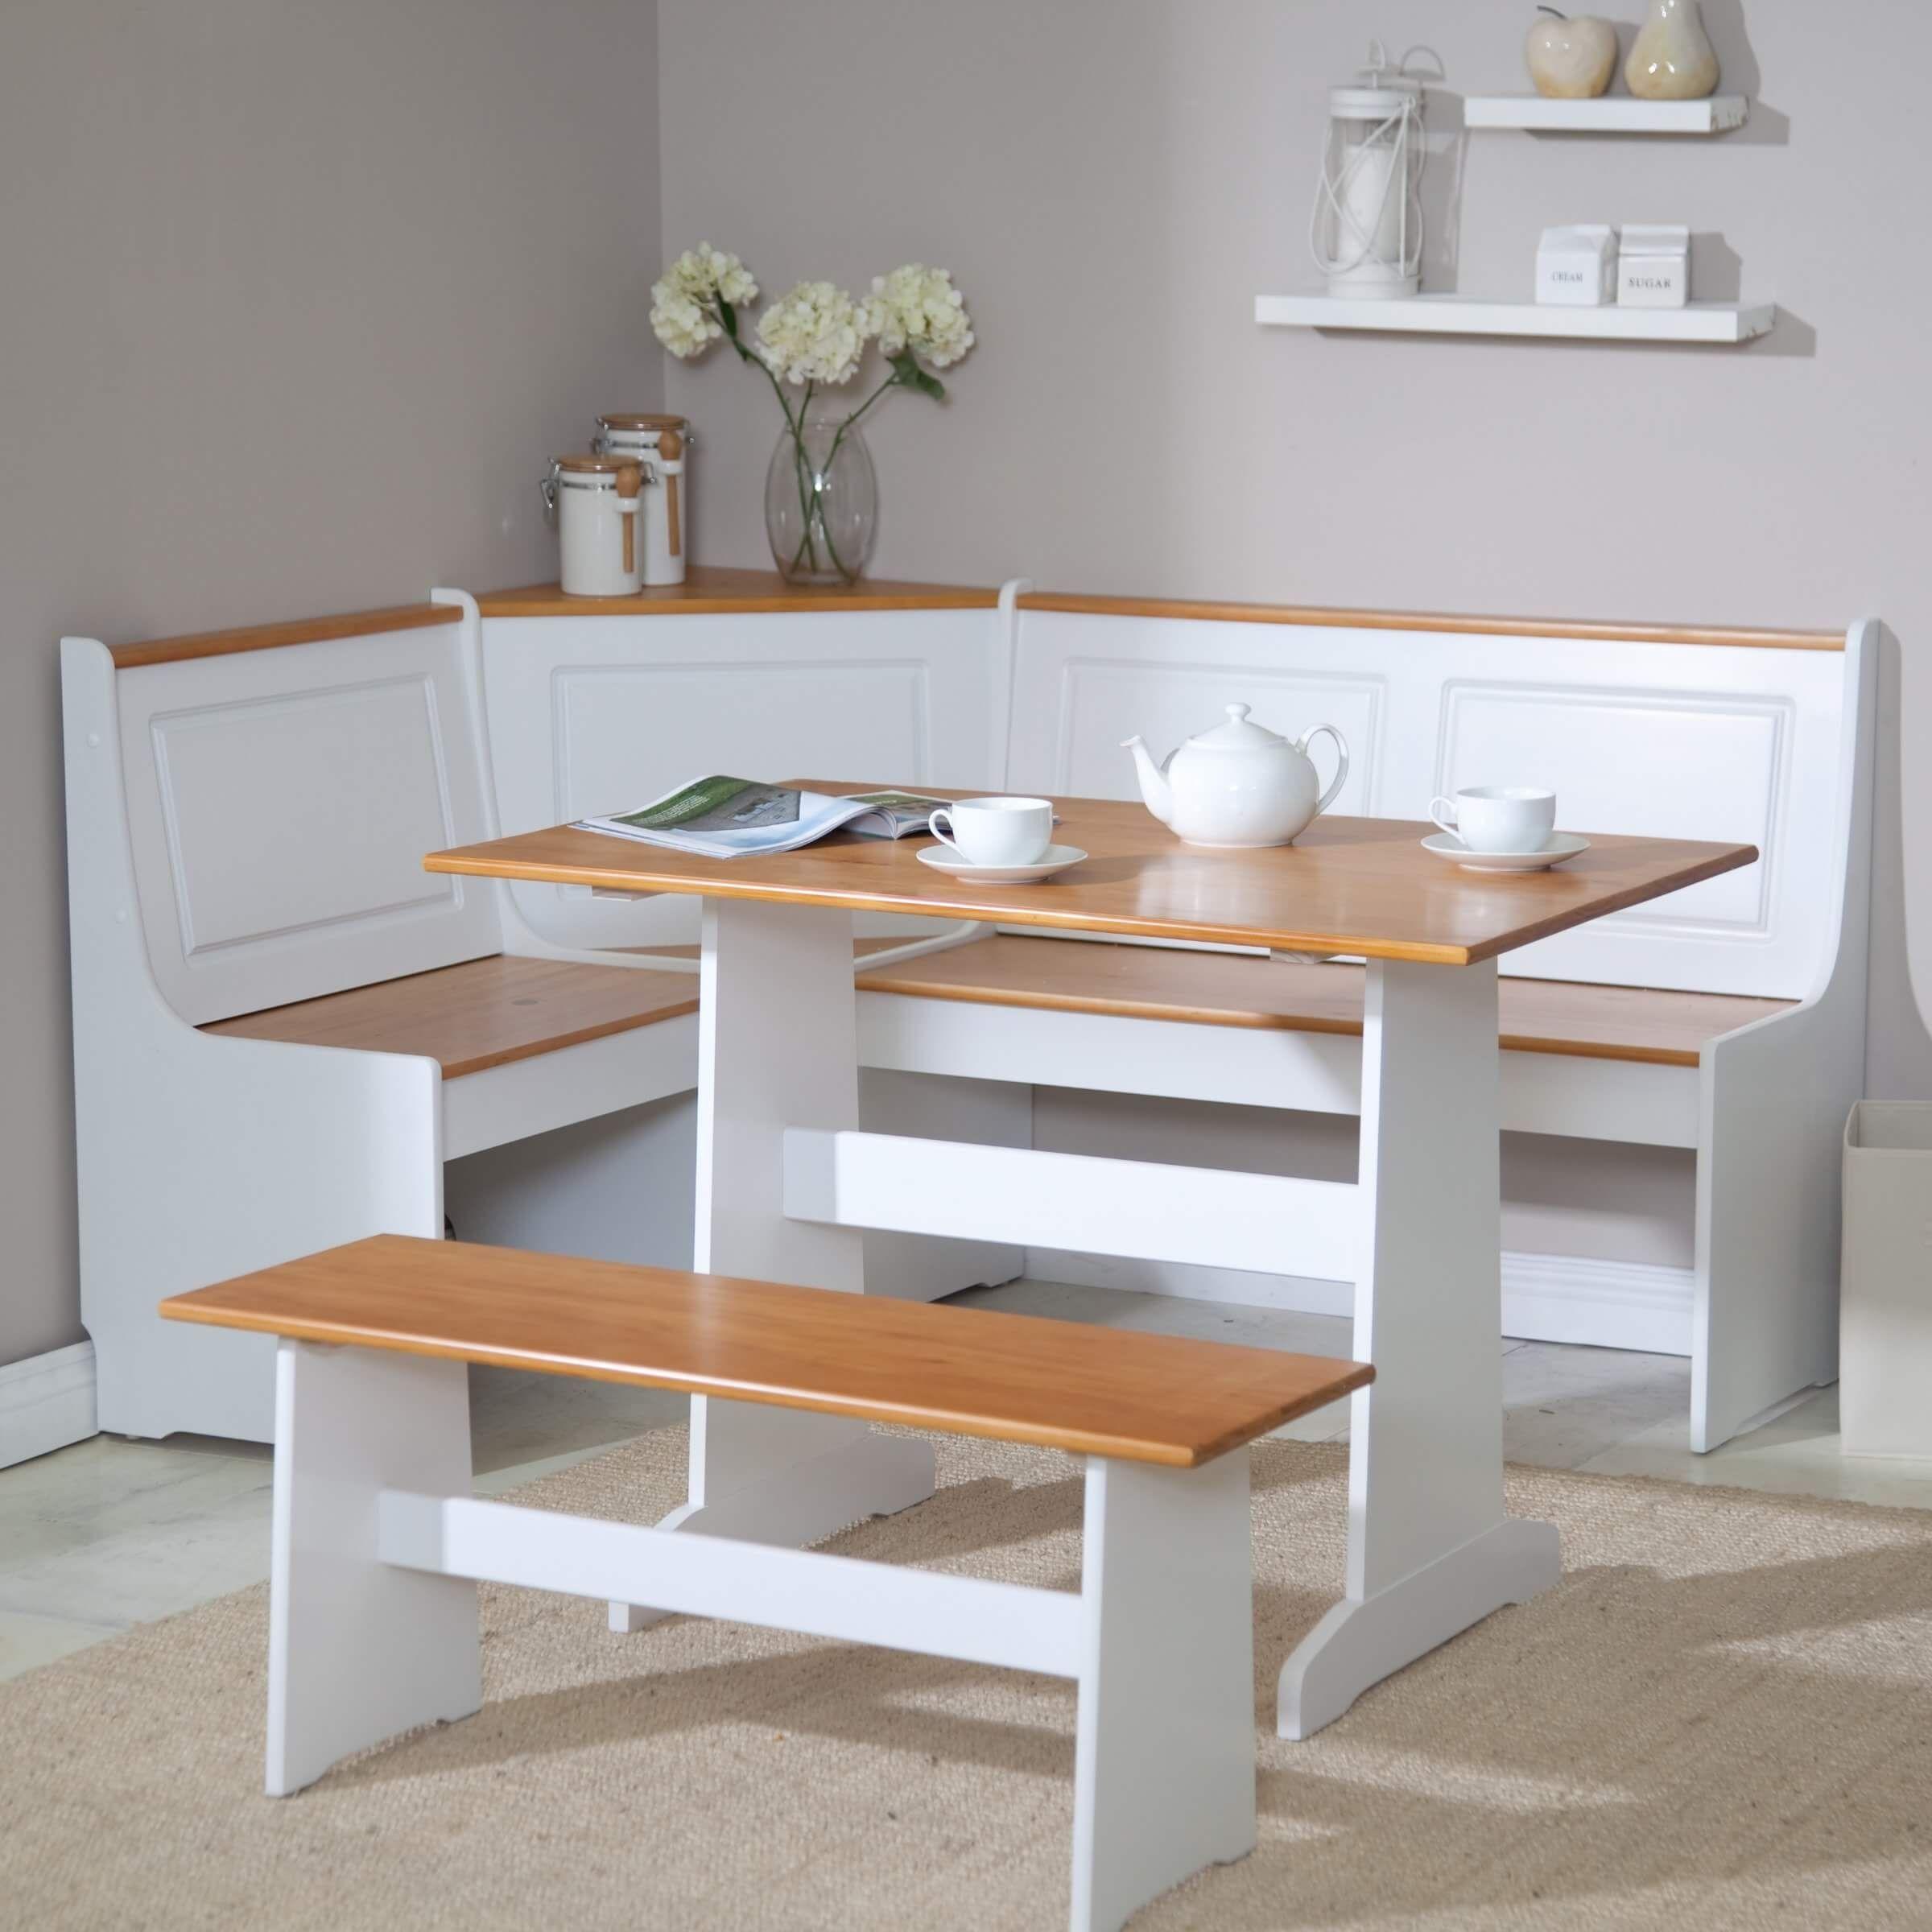 Nook Kitchen Table And Bench Http Manageditservicesatlanta Net  ~ Banco Esquinero Para Cocina Ikea